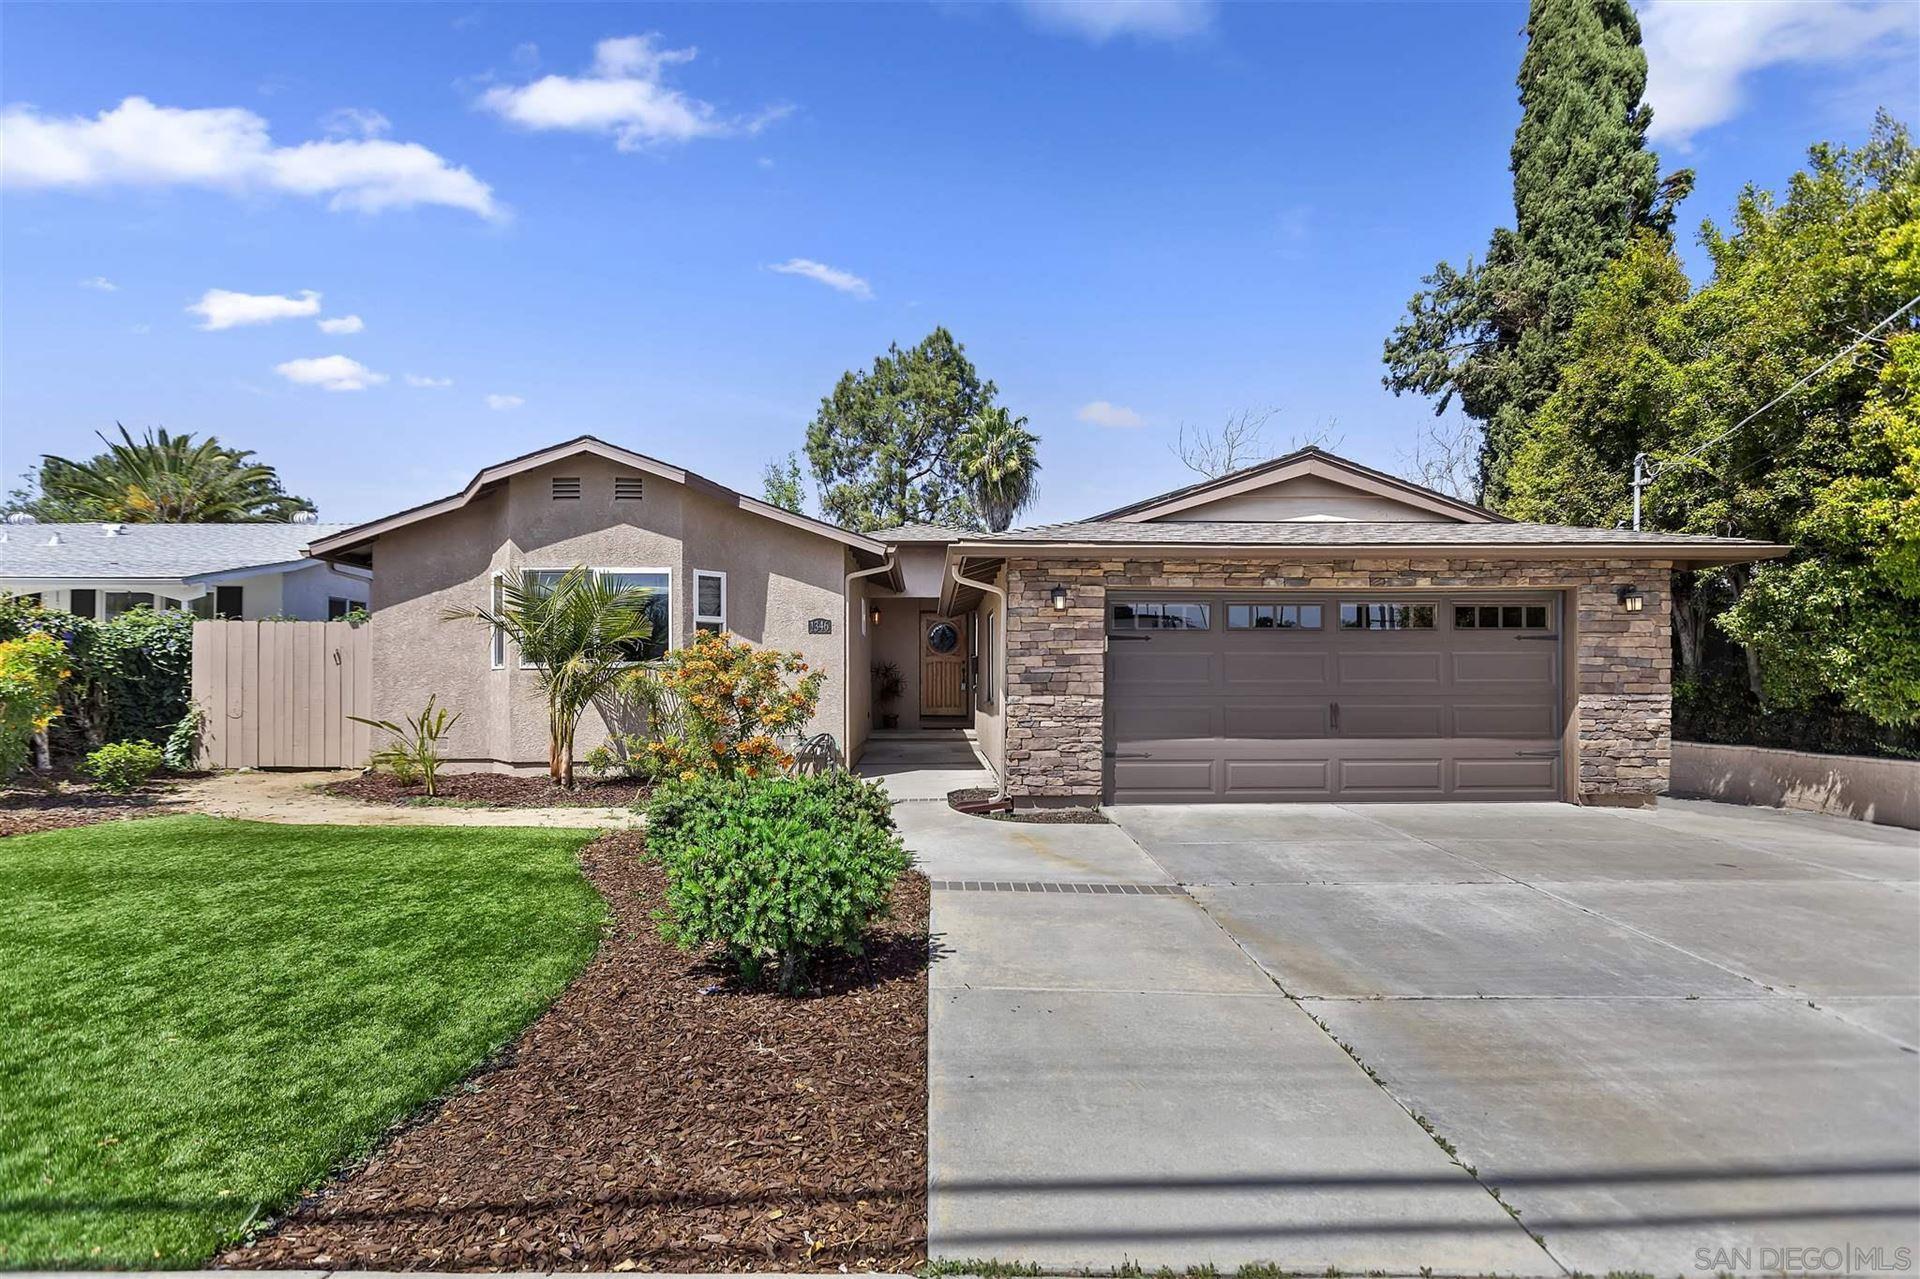 Photo of 1346 Swallow Drive, El Cajon, CA 92020 (MLS # 210009474)